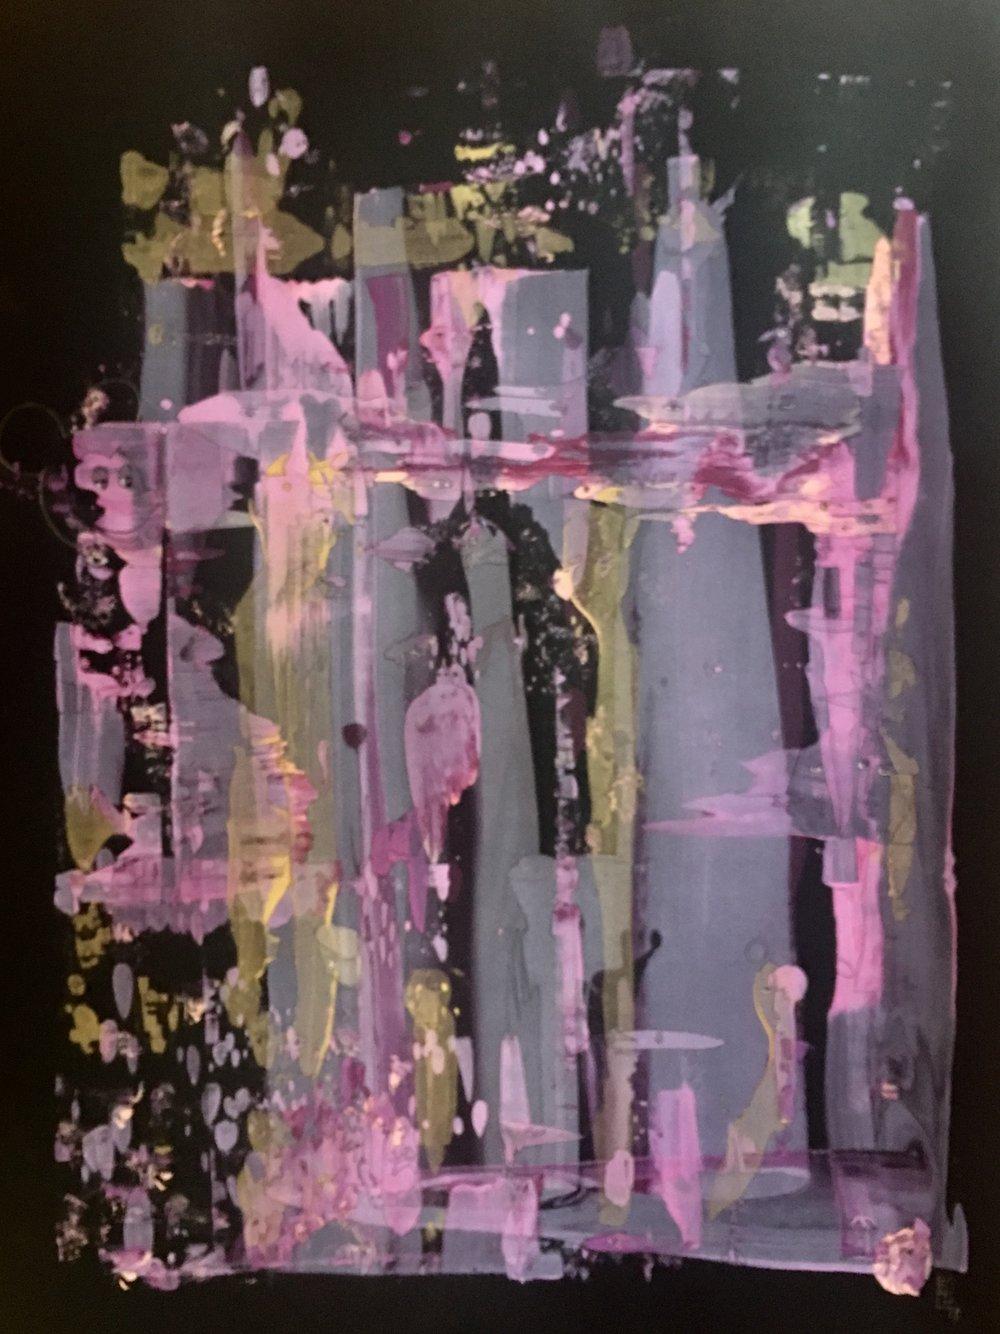 "Yelena Lezhen, 'Pink Utopia', Acrylic and Ink on Paper, 30x22"", 2018"